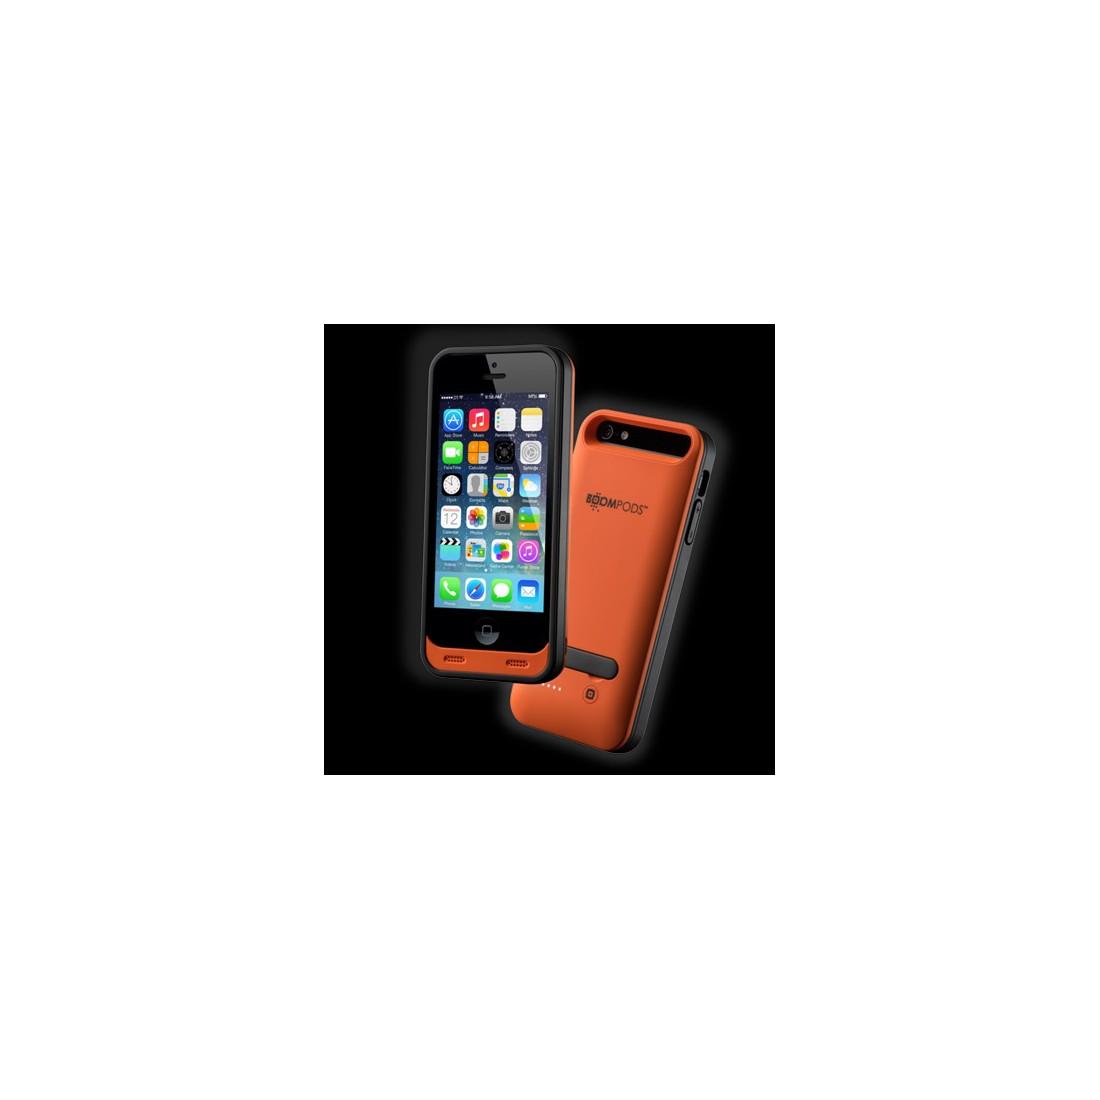 Funda Smartphone - Boompods PCORA, Iphone 5, Naranja